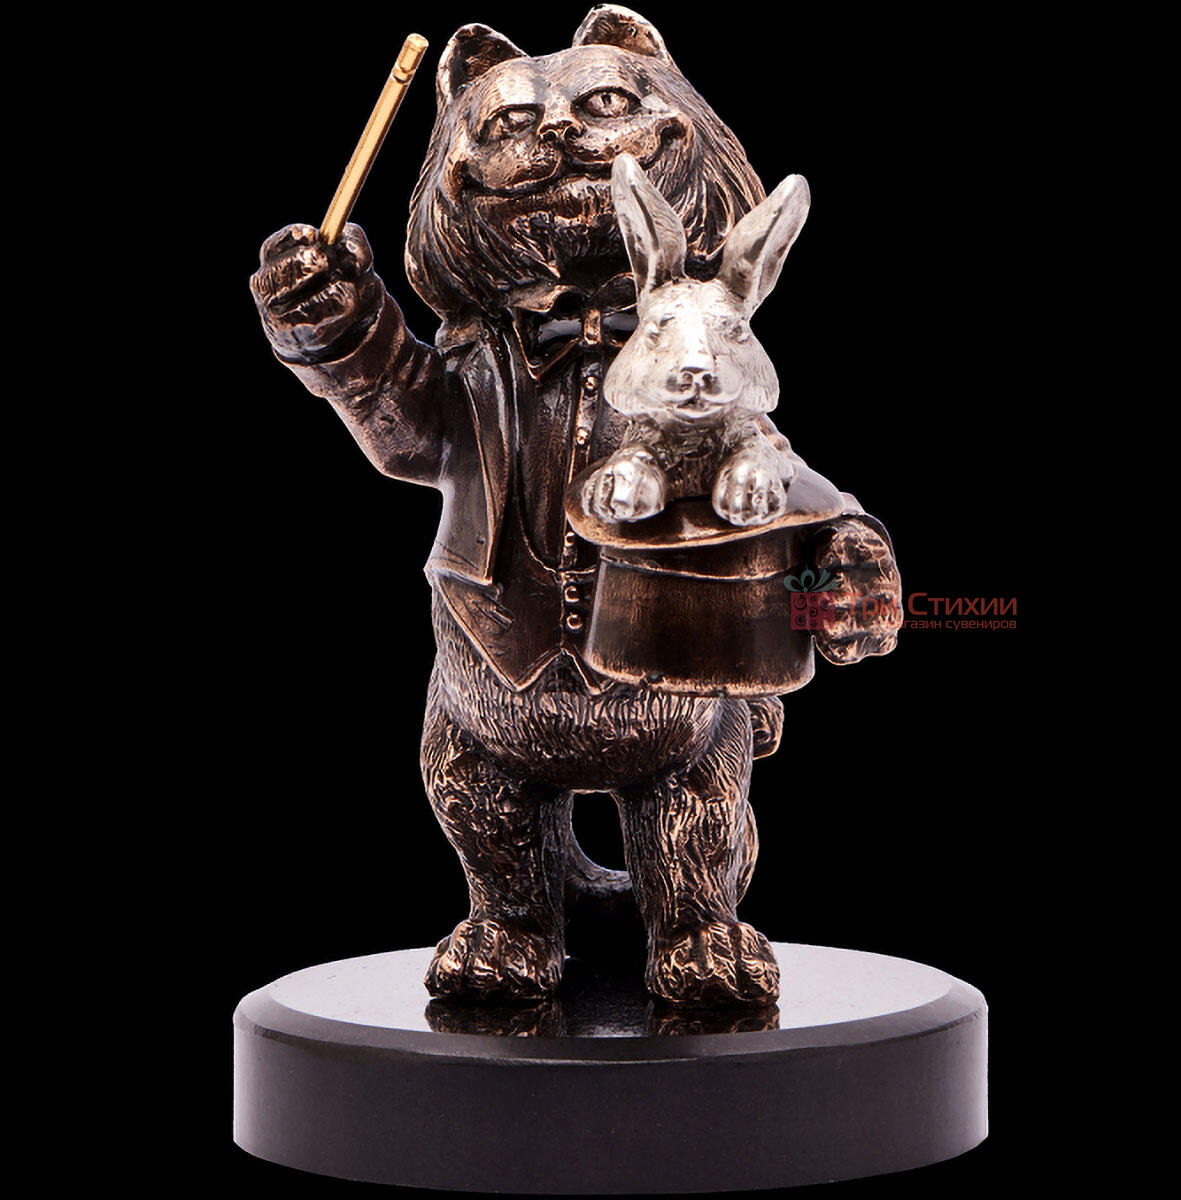 Статуэтка из бронзы «Лови удачу» Vizuri (Визури) C01, фото 3